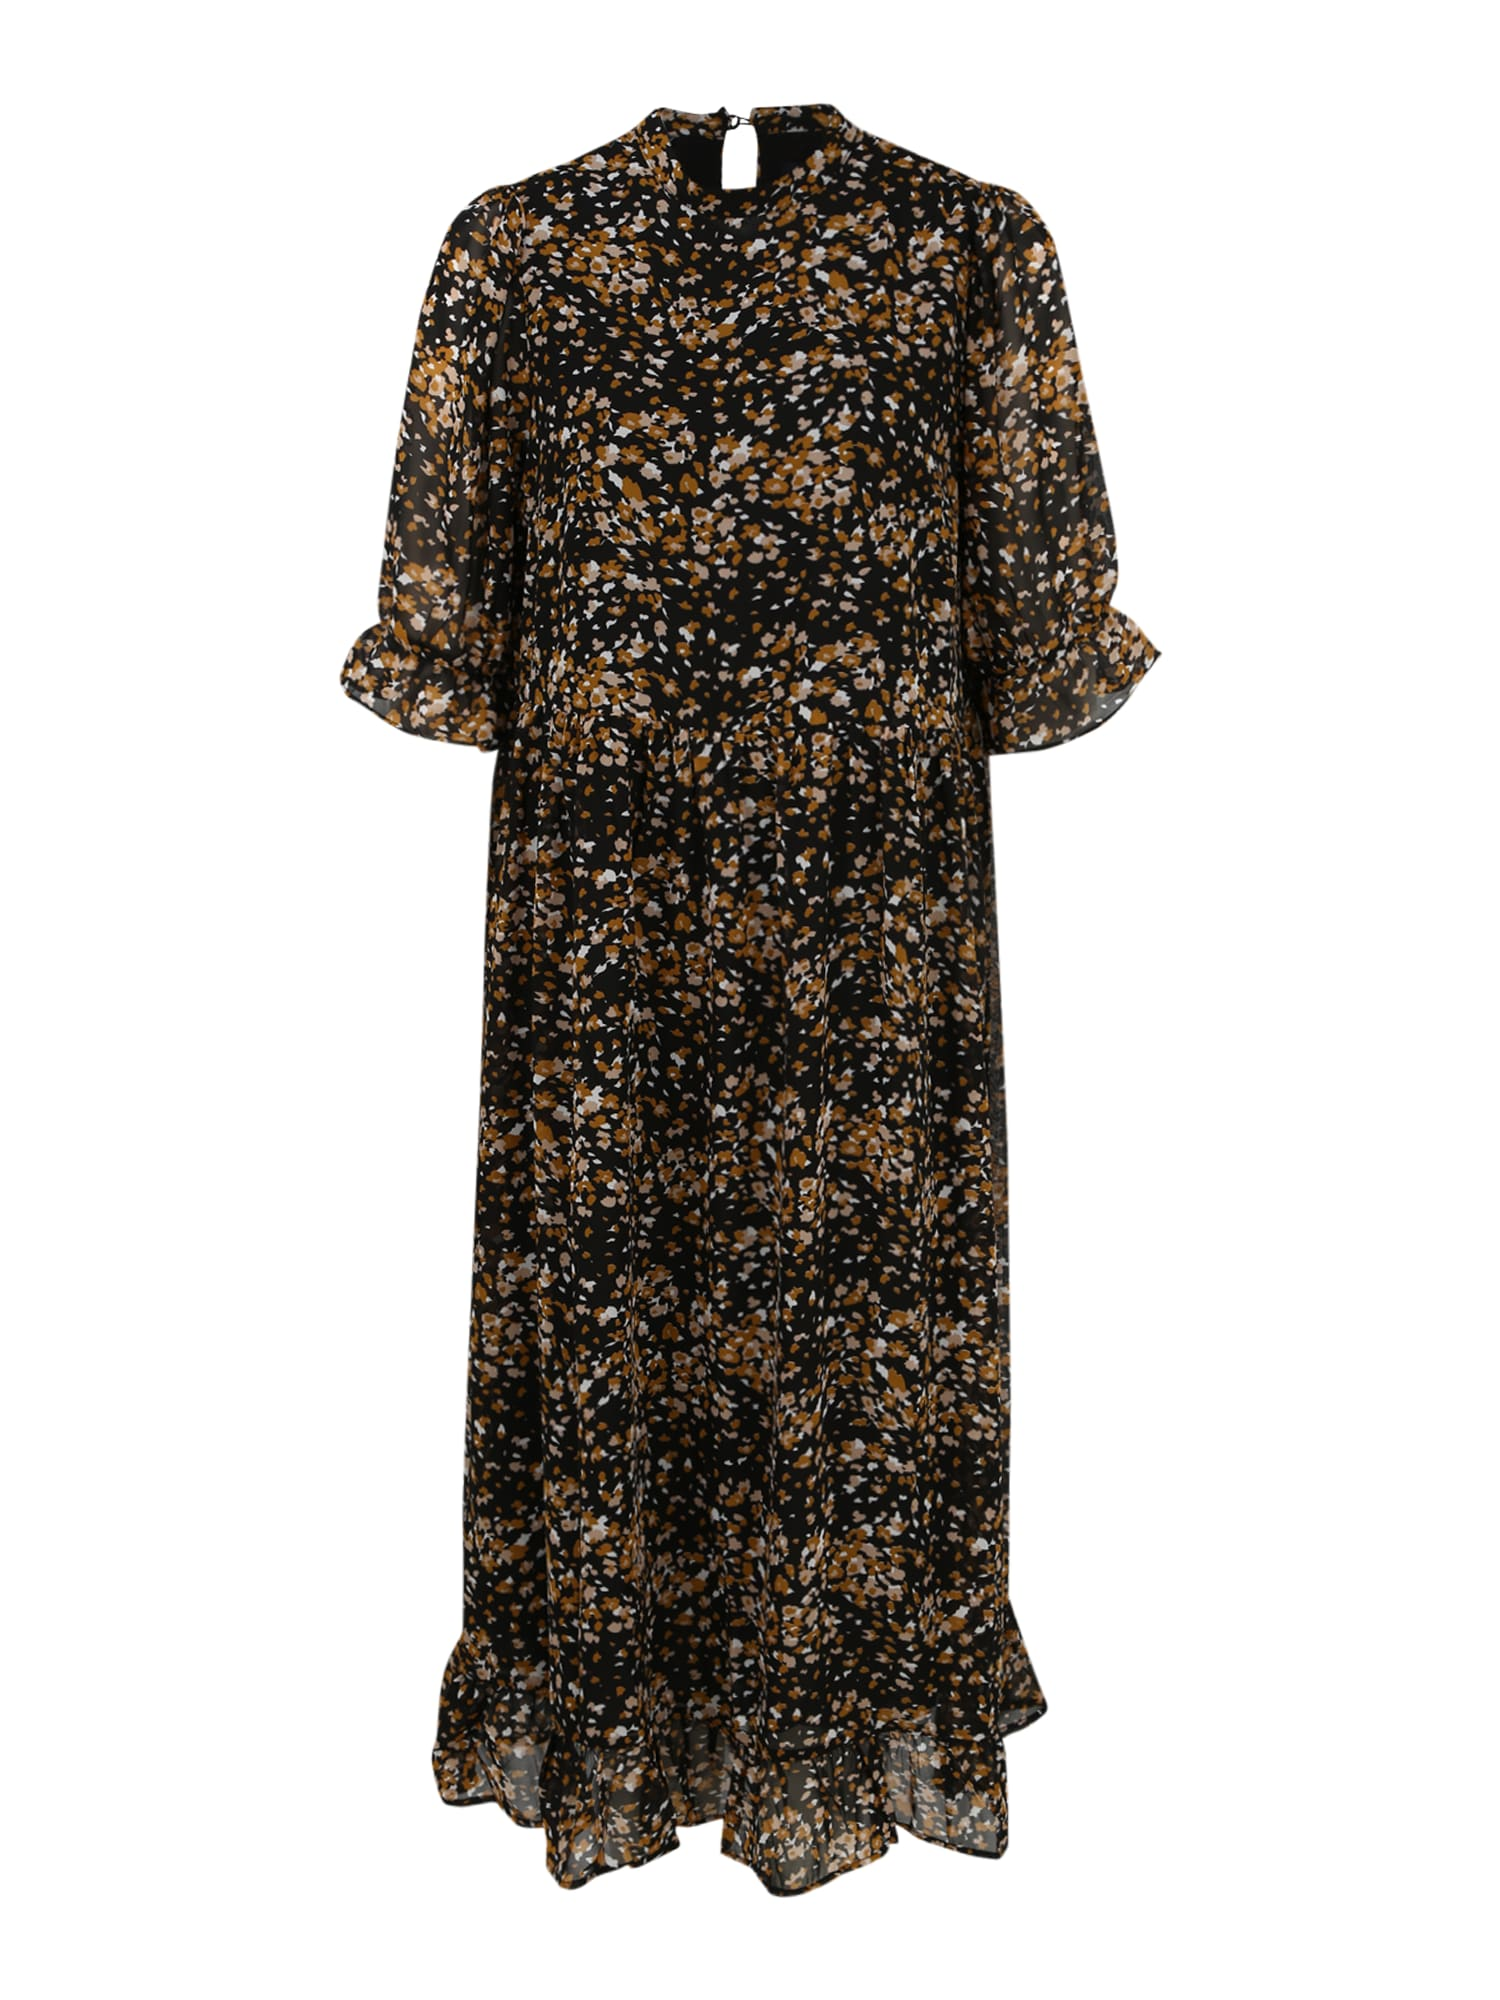 Selected Femme (Tall) Suknelė